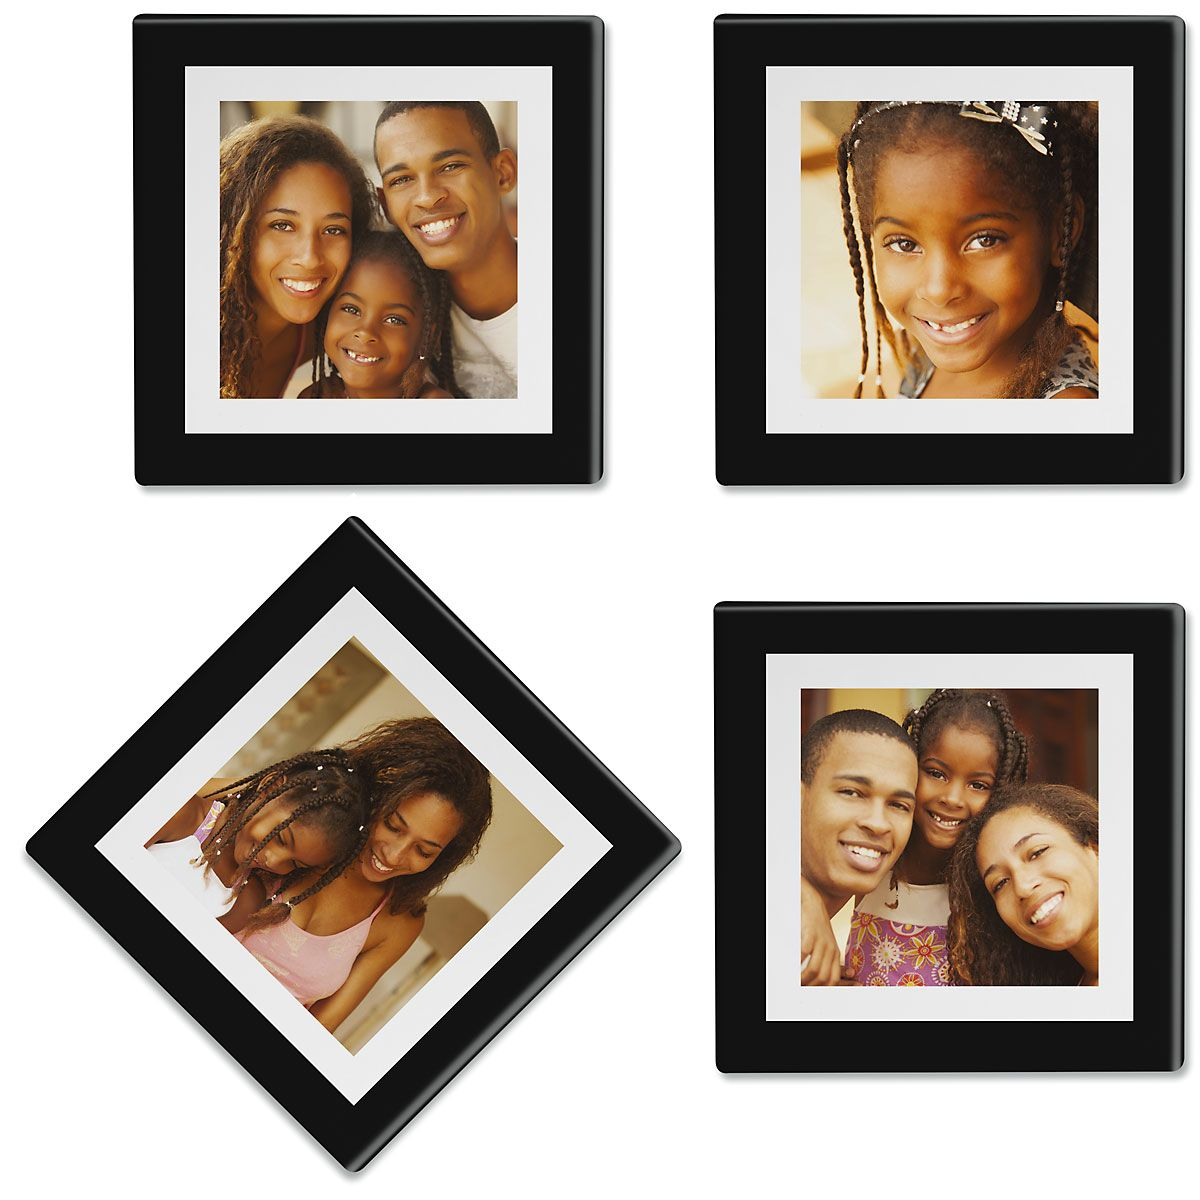 Duel Frame Photo Coasters